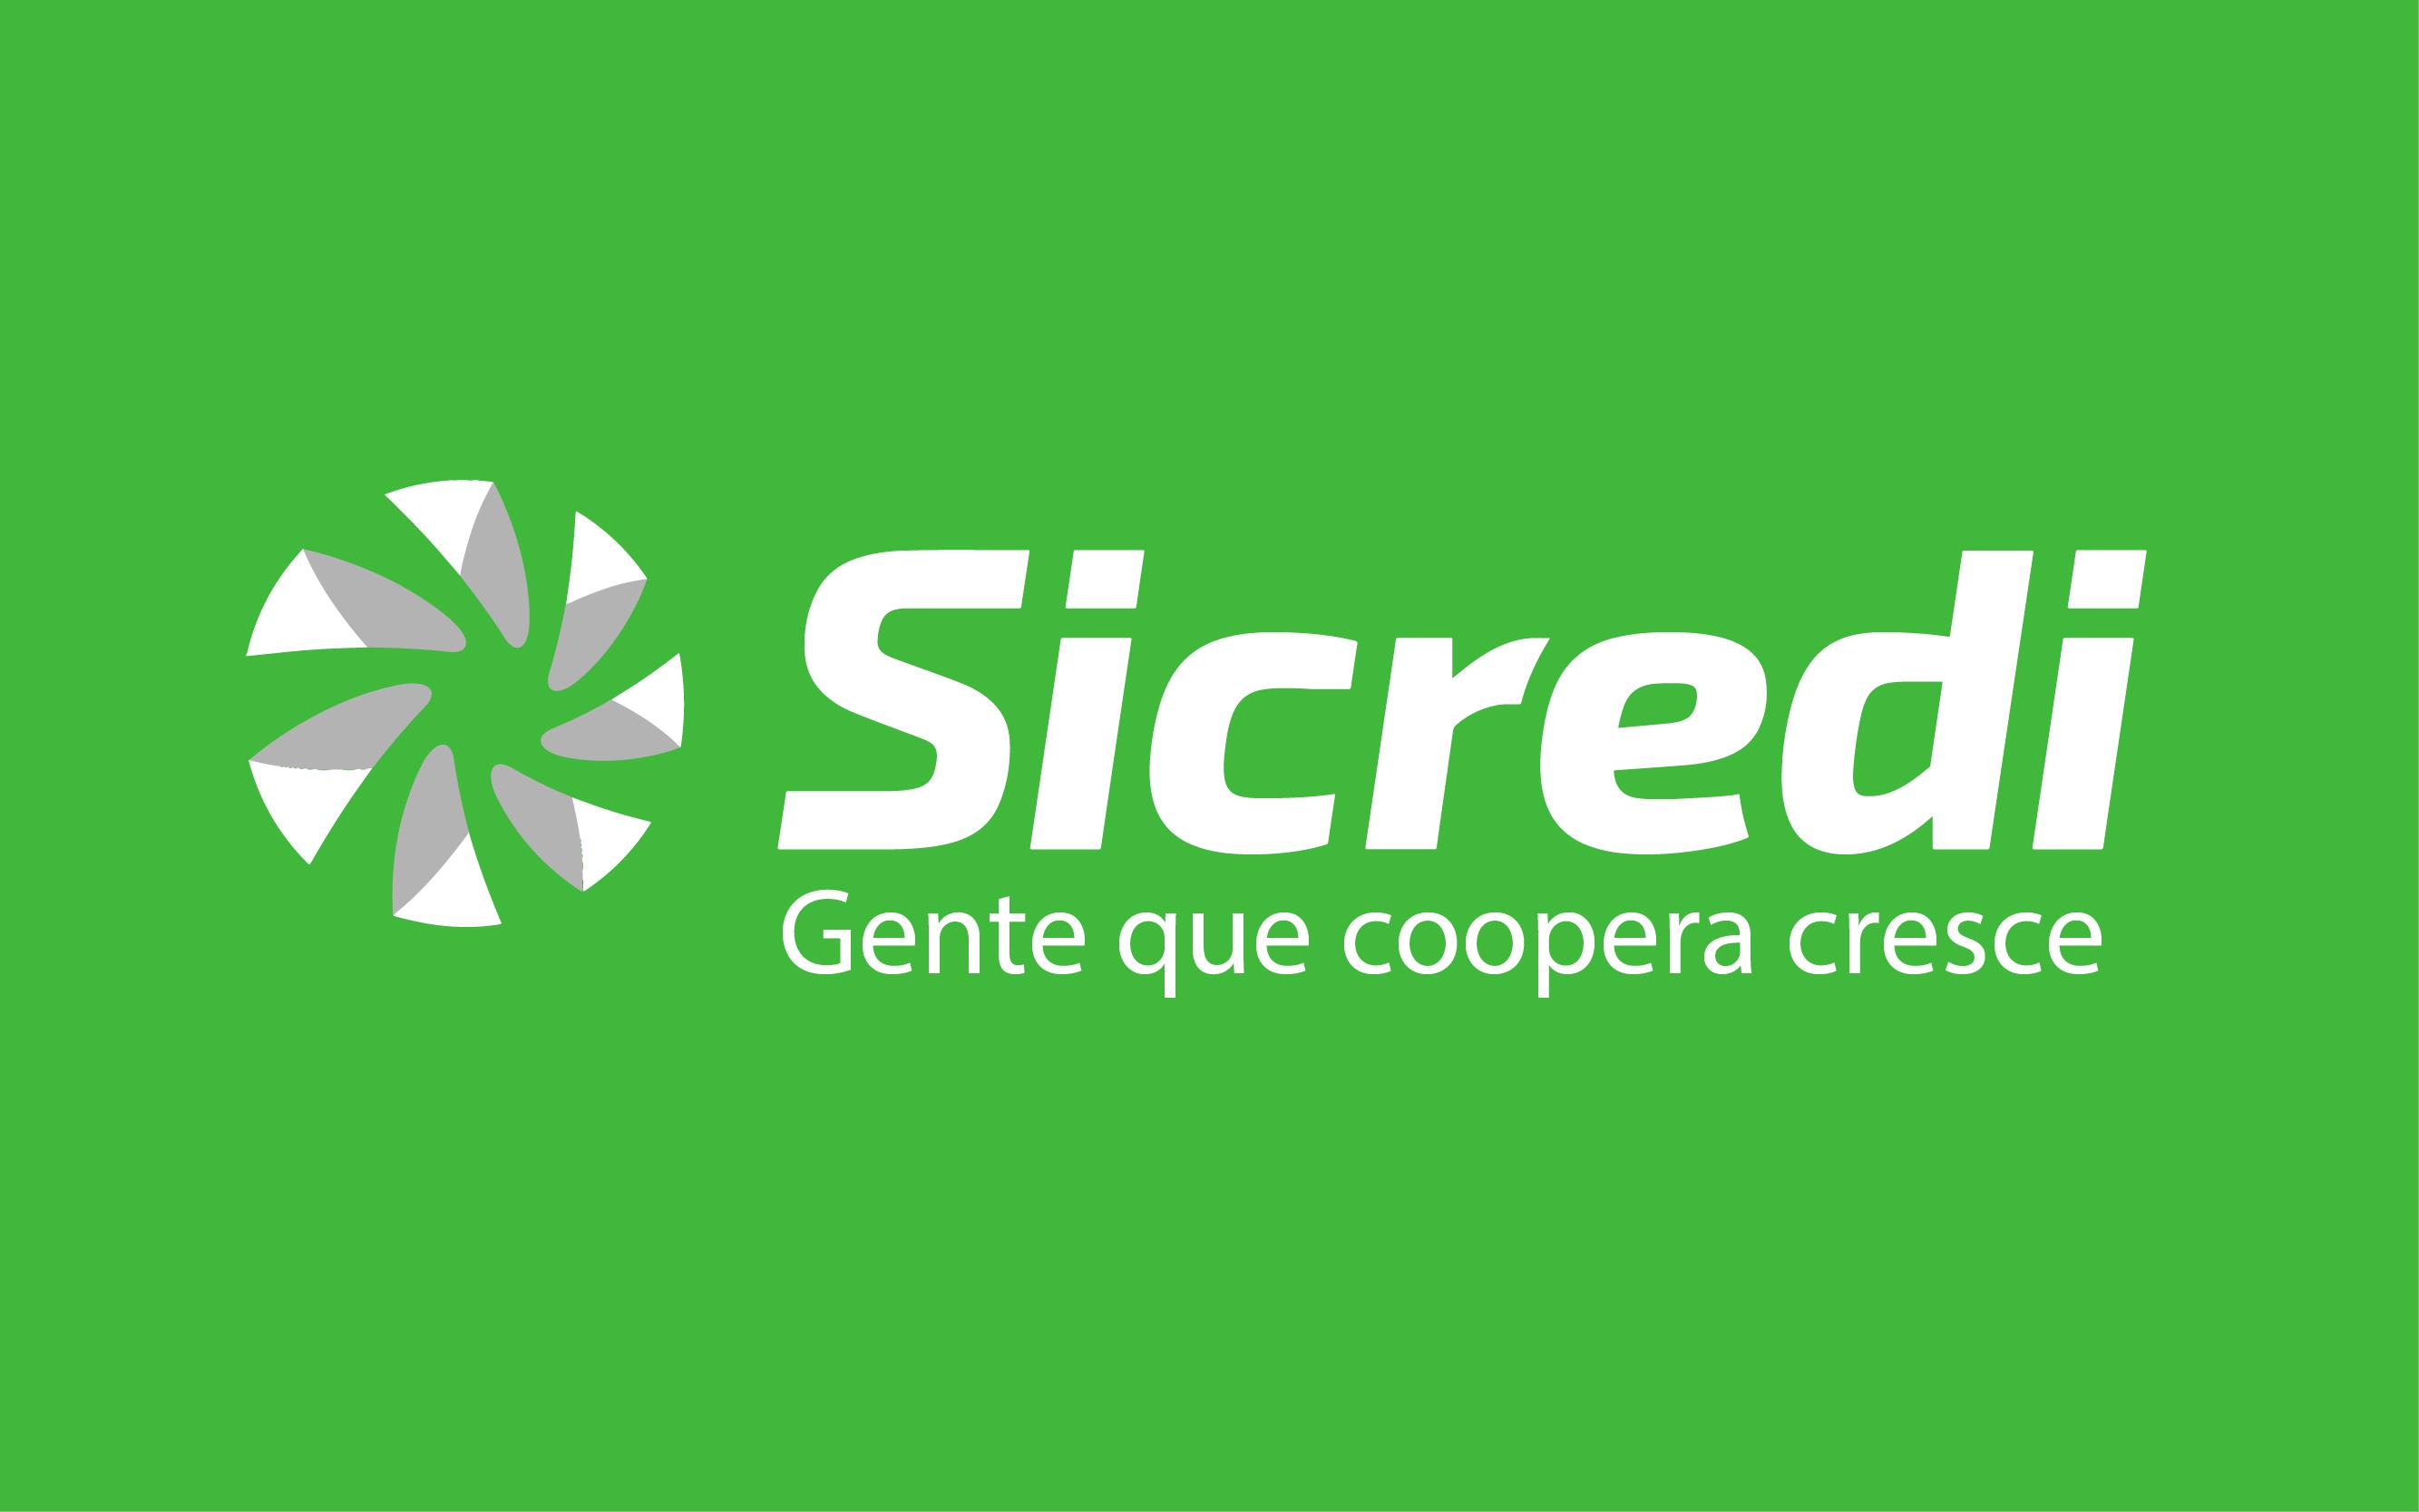 LOGO SICREDI-01